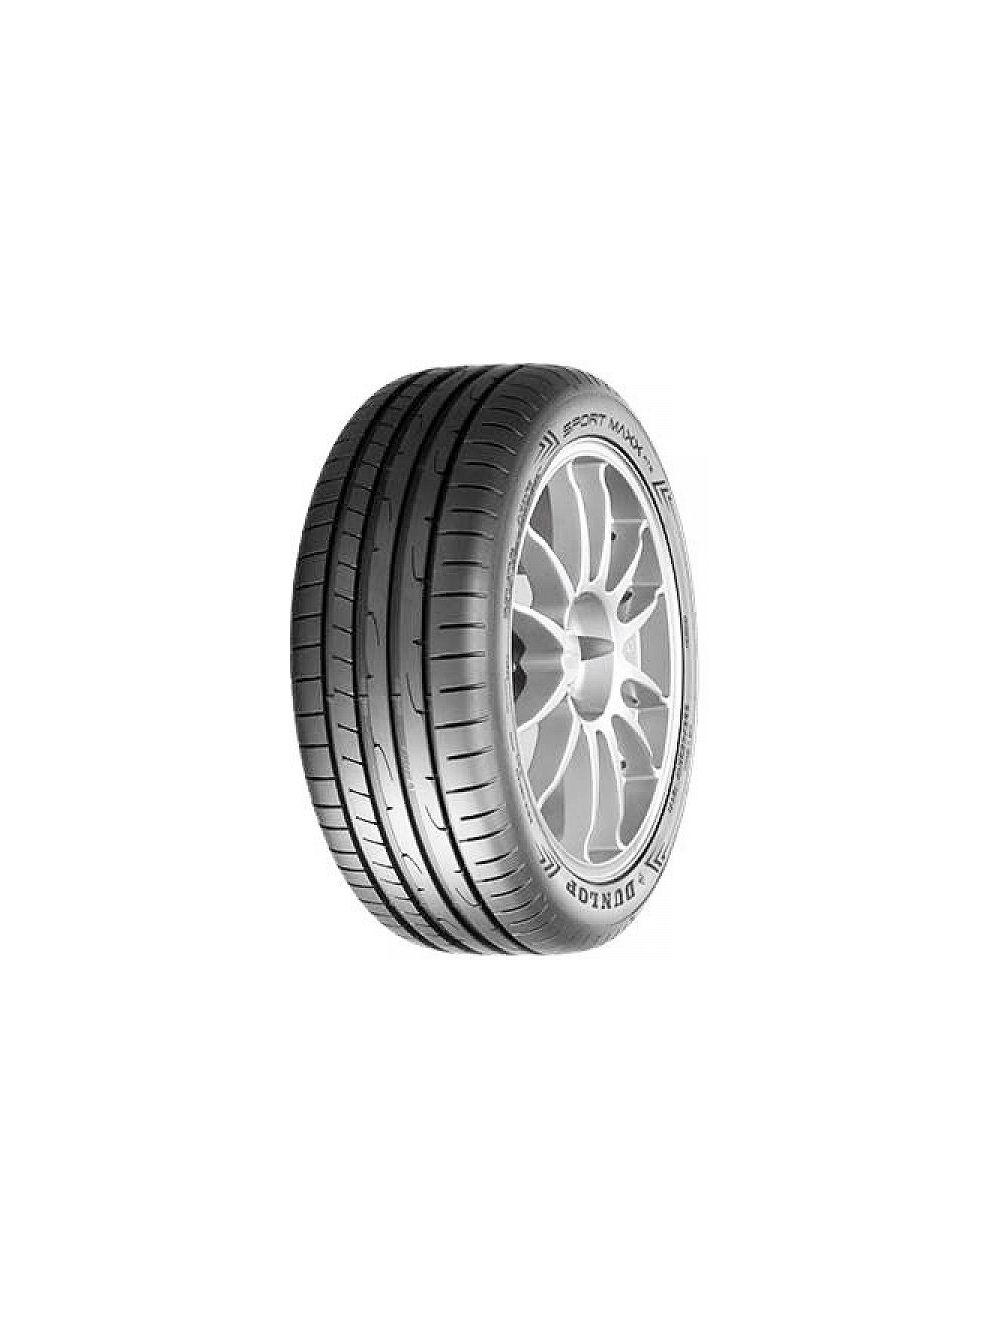 Dunlop 235/55R18 V SP Sport Maxx RT2 SUV MFS Nyári gumi